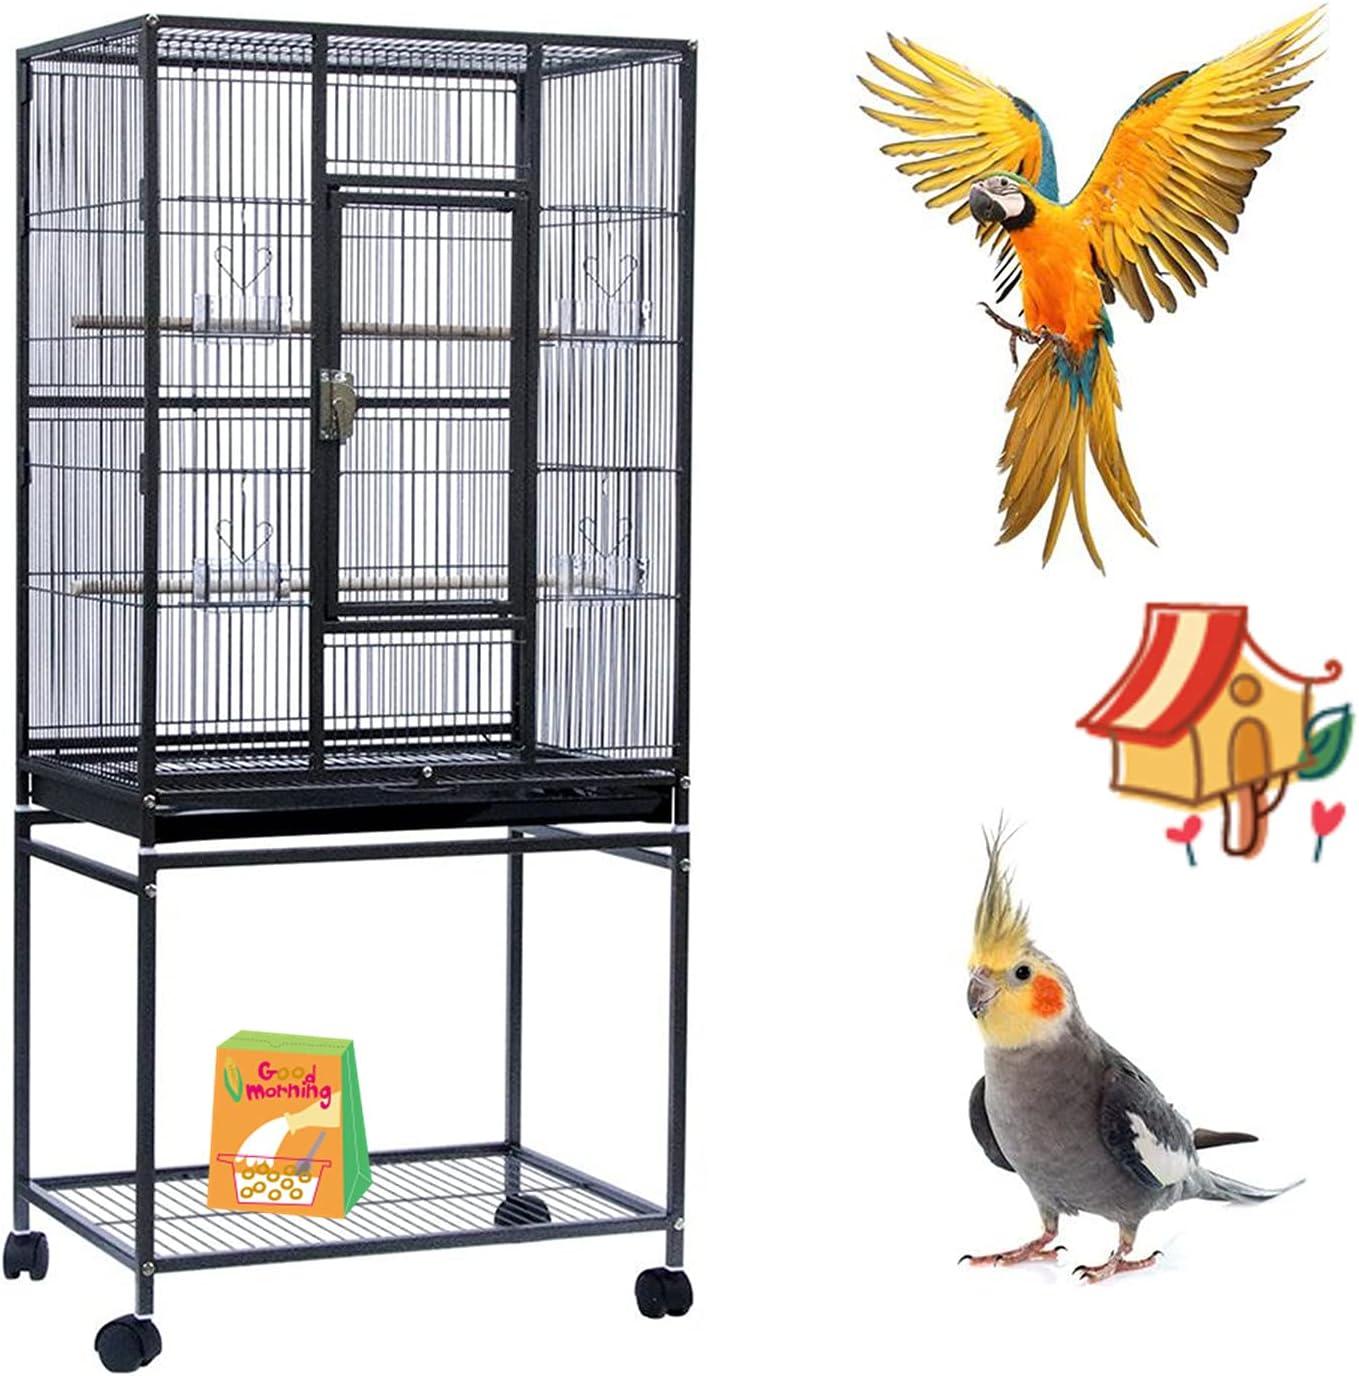 YIZHE Jaulas para pájaros,Jaula Pájaros Metal,Jaulas Grandes,Jaulas para Aves,Jaula de Aves Exterior,Jaula con Ruedas,Portátil con 4 Ruedas giratorias de 360° Soporte Desmontable(61.5*43*137cm Negro)